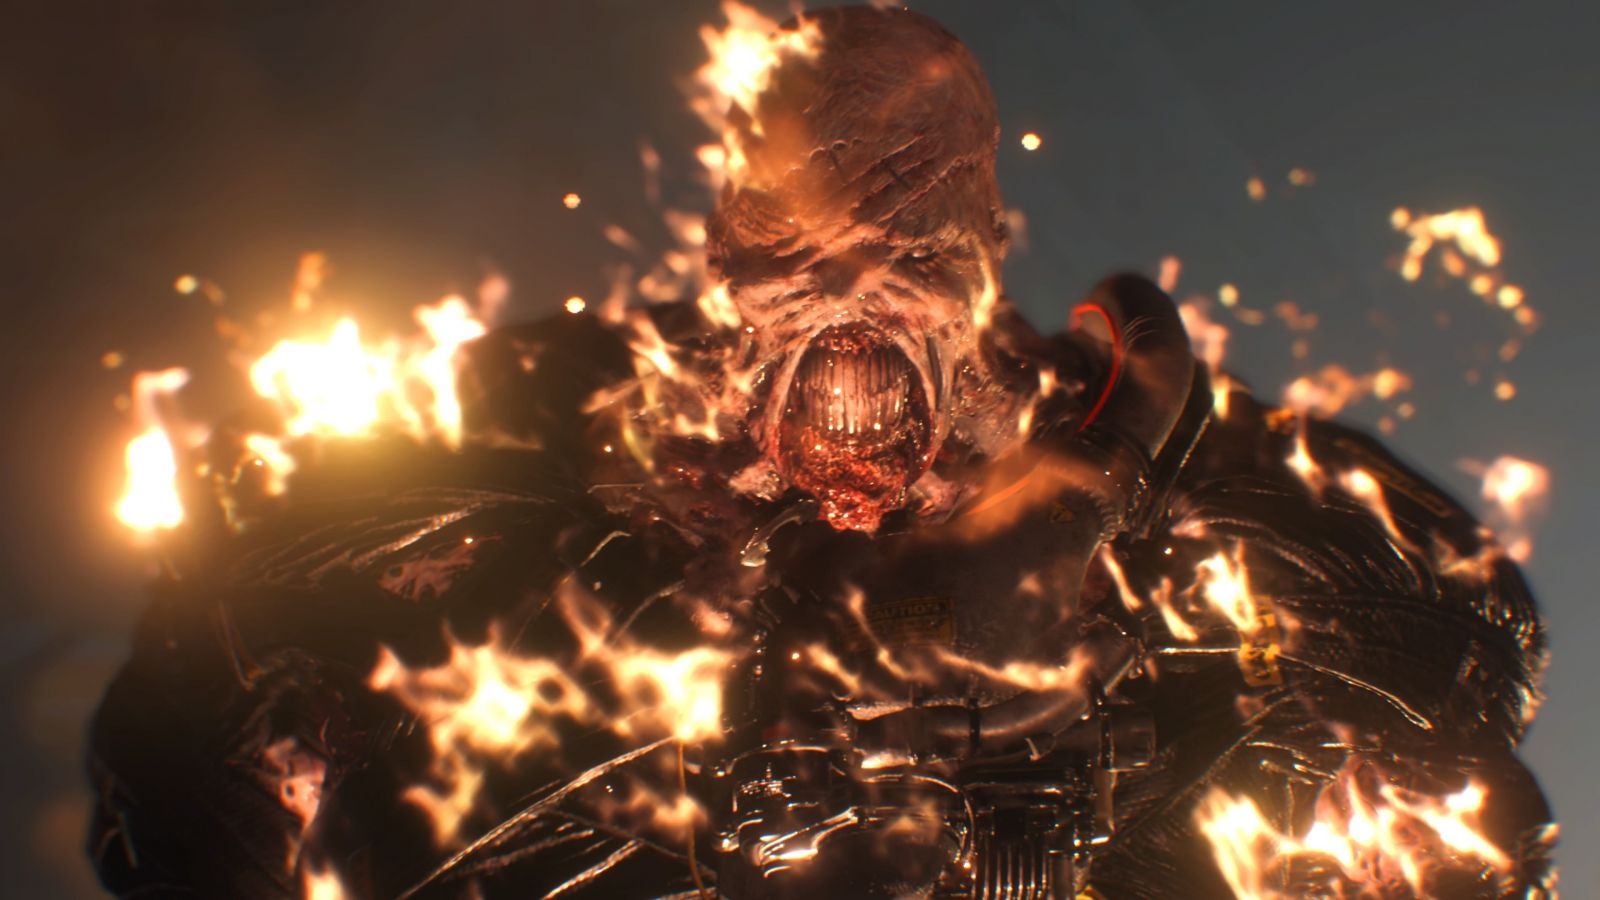 Recenzia: Resident Evil 3